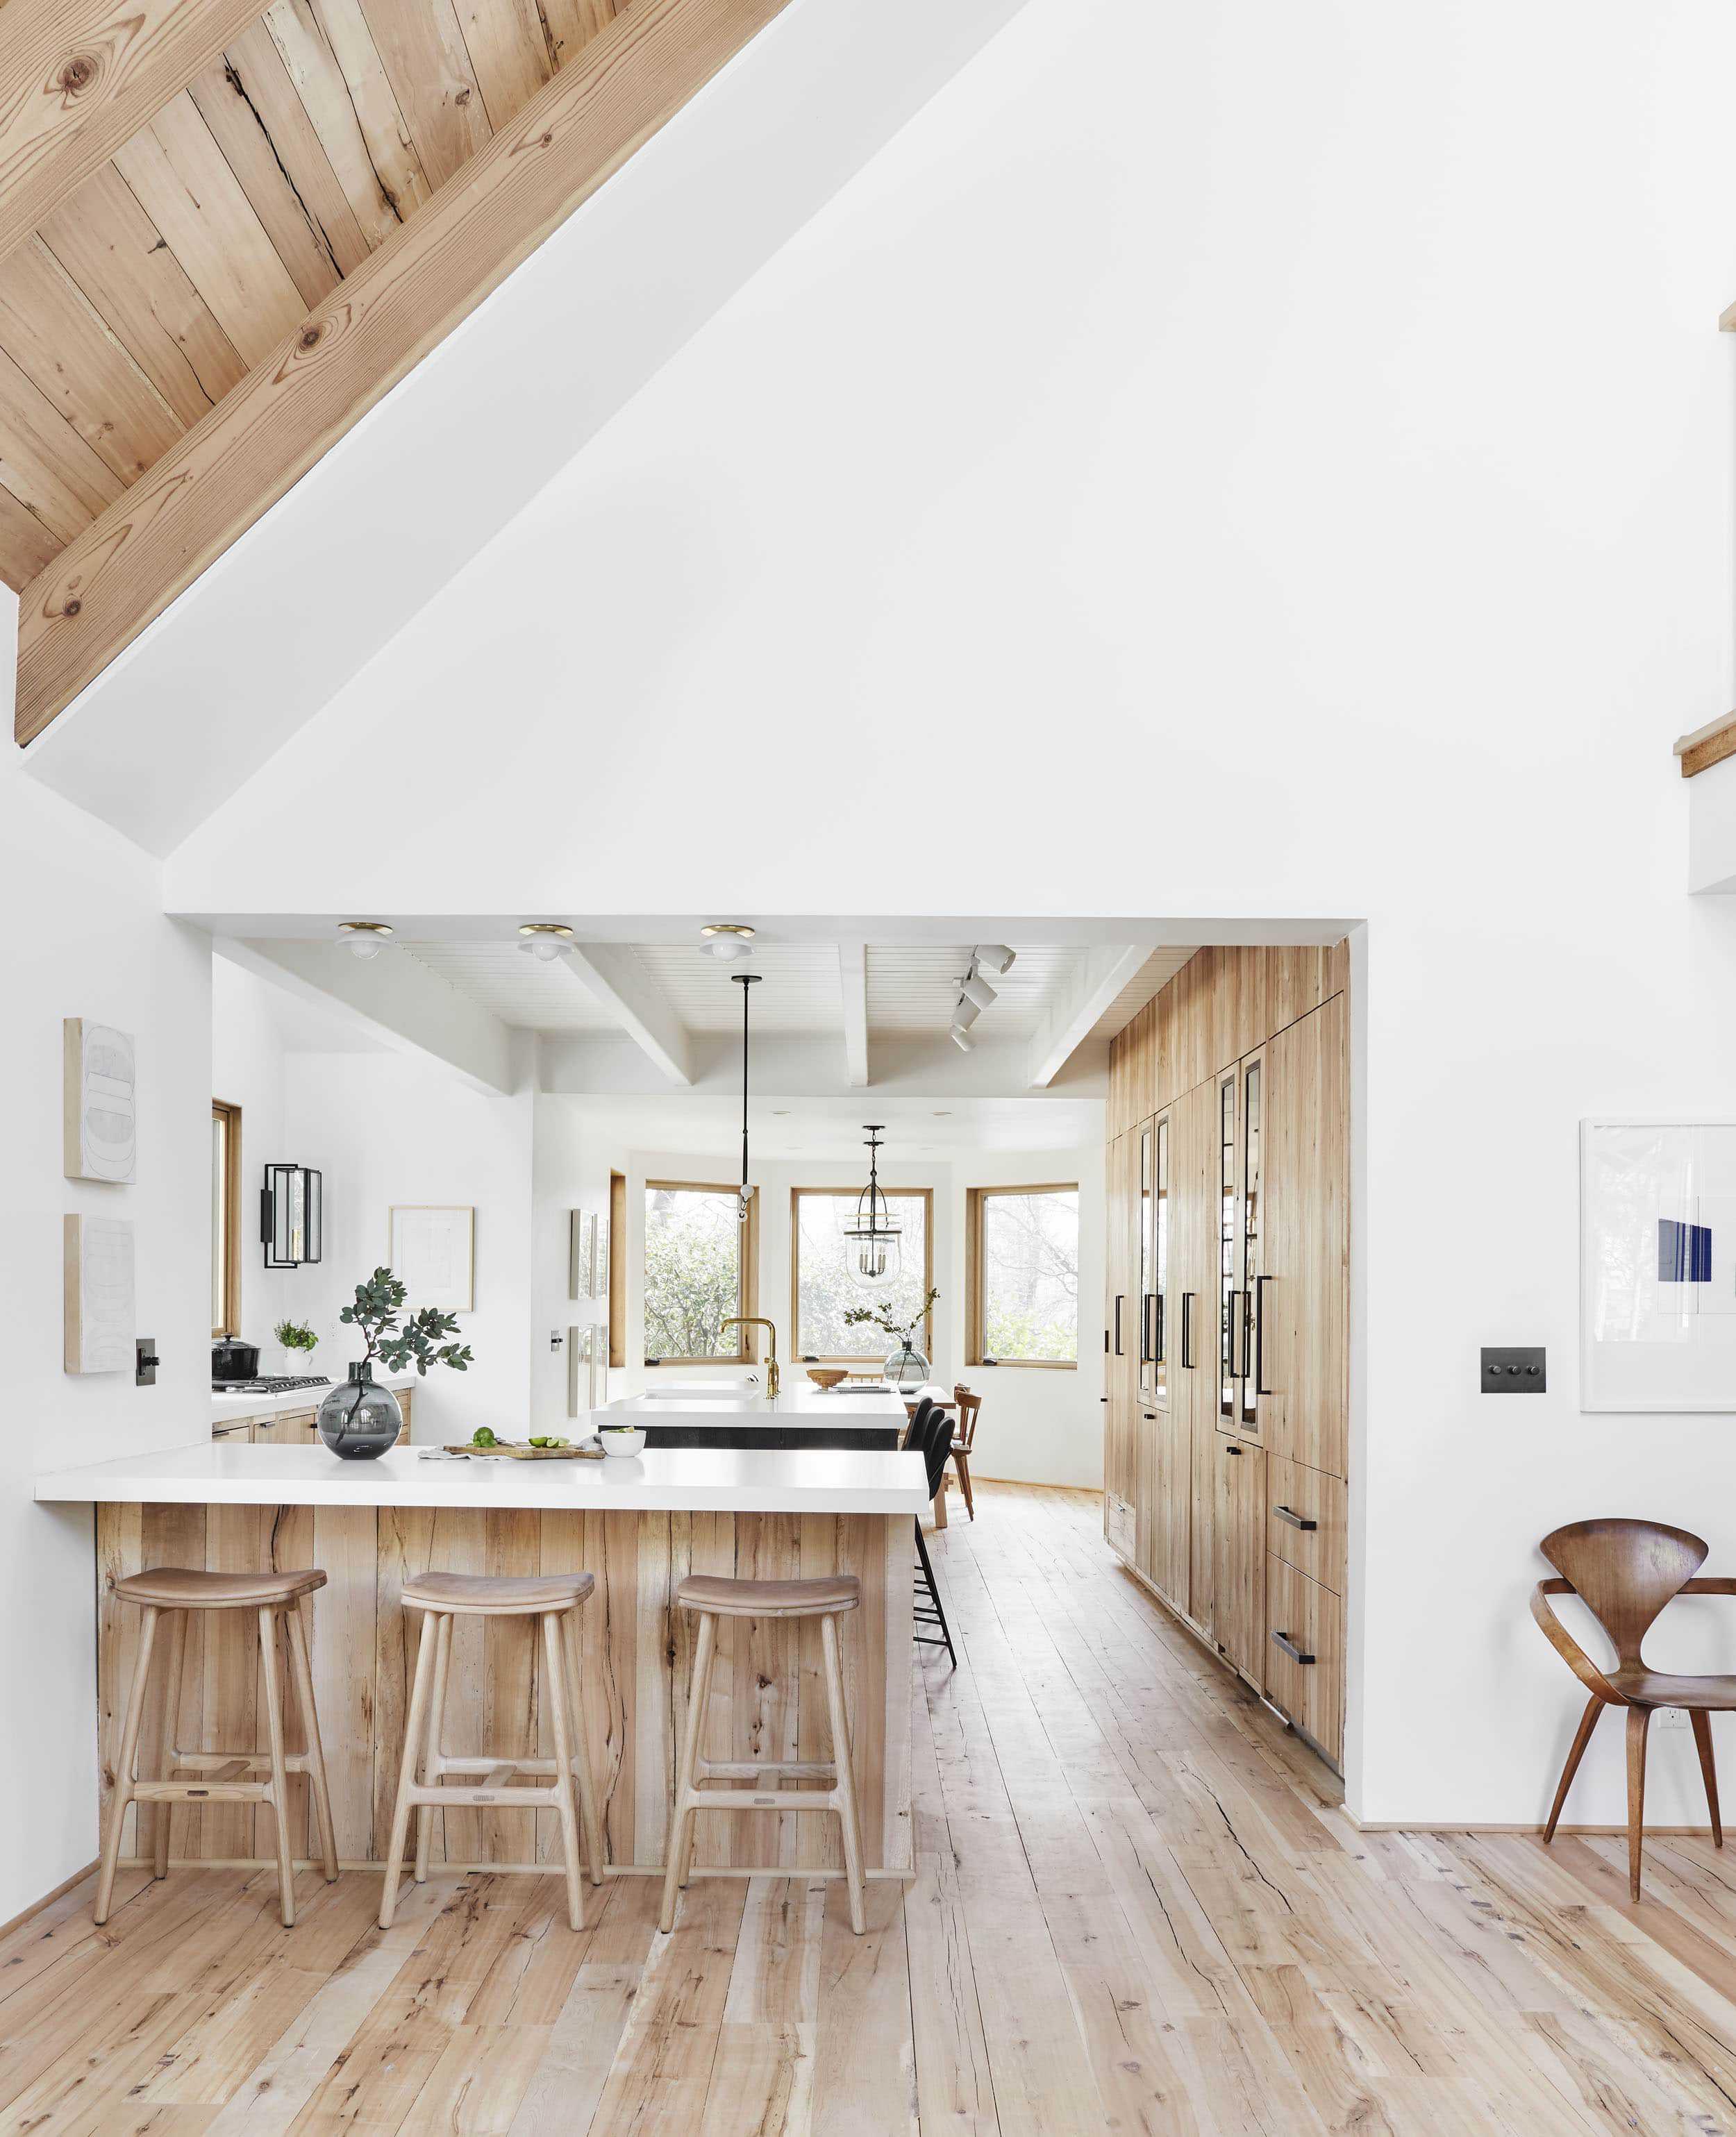 Emily Henderson Mountain House Scandinavian kitchen remodel_31